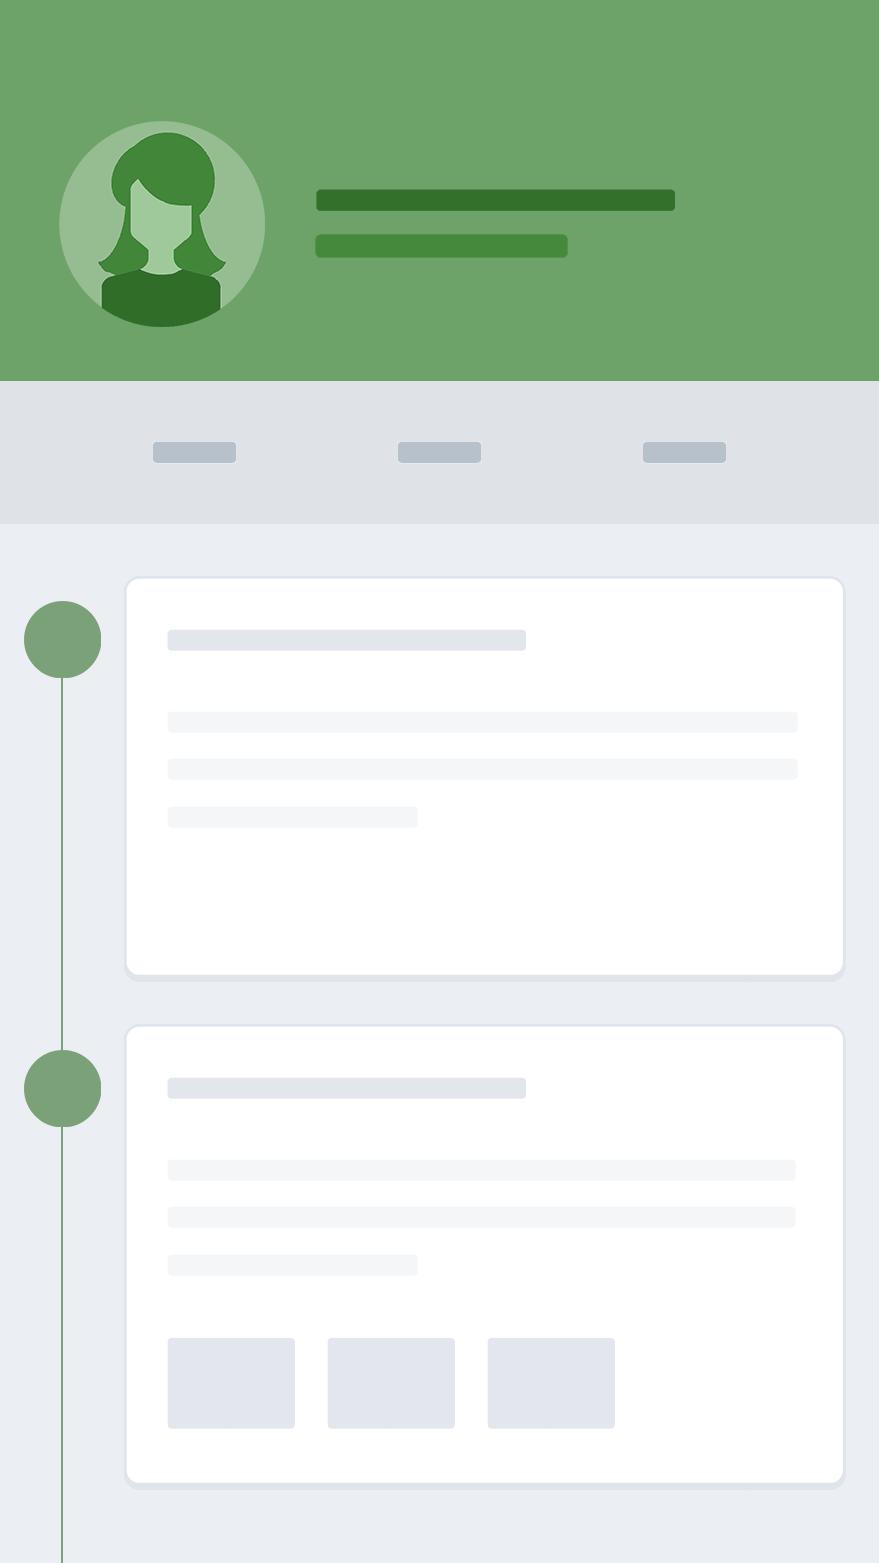 closr-app-contact-timeline.png